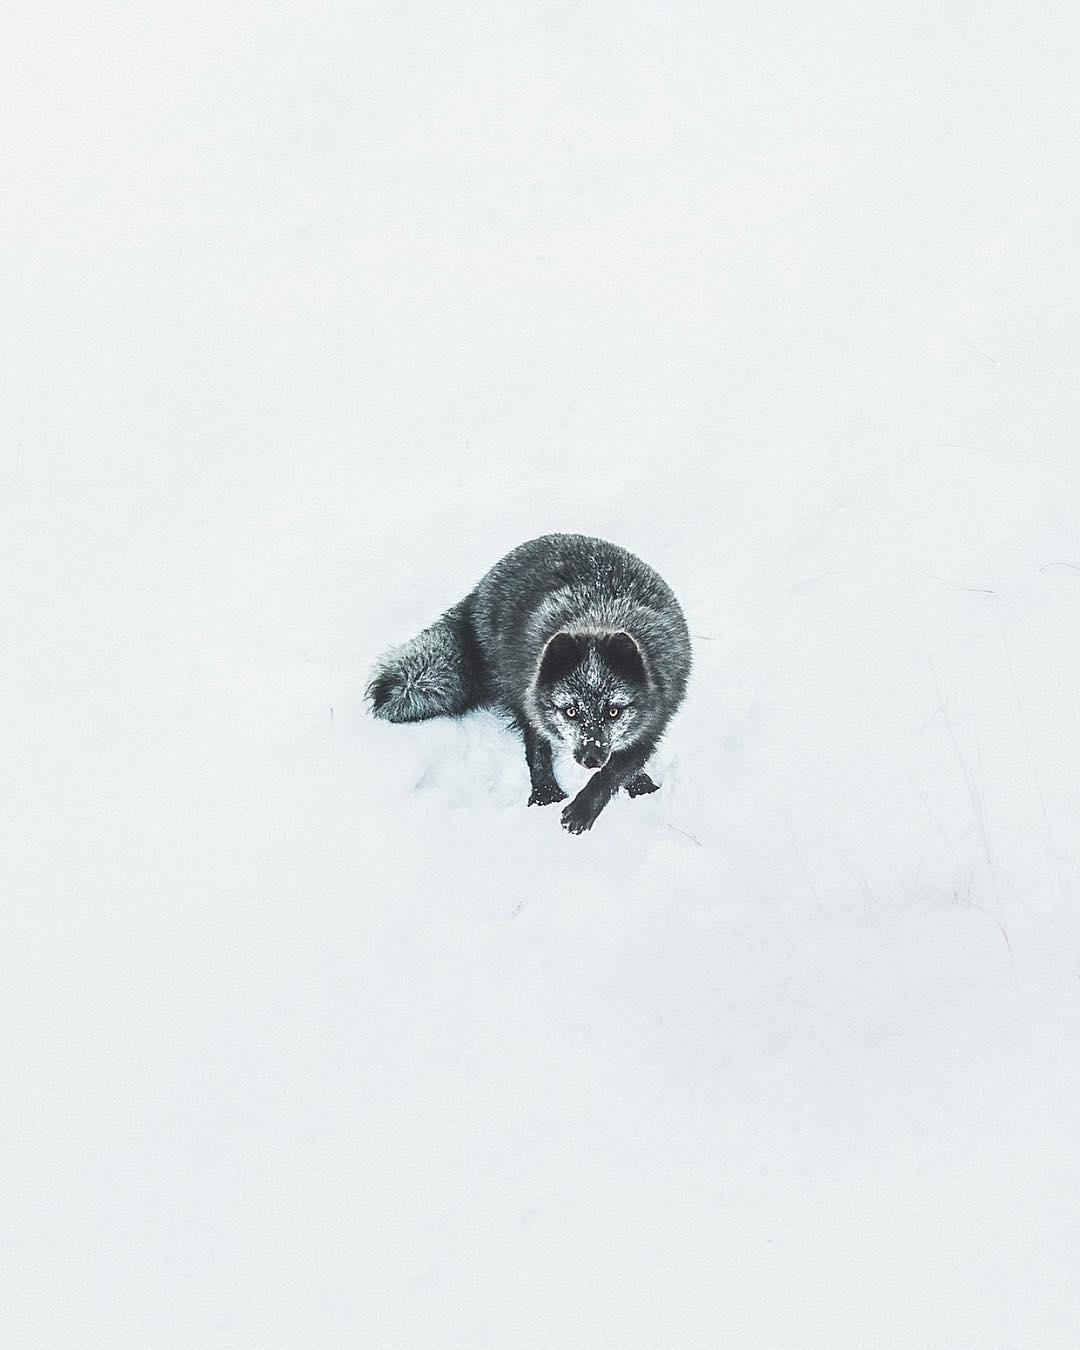 Iceland In Aerial Photographs By Benjamin Hardman